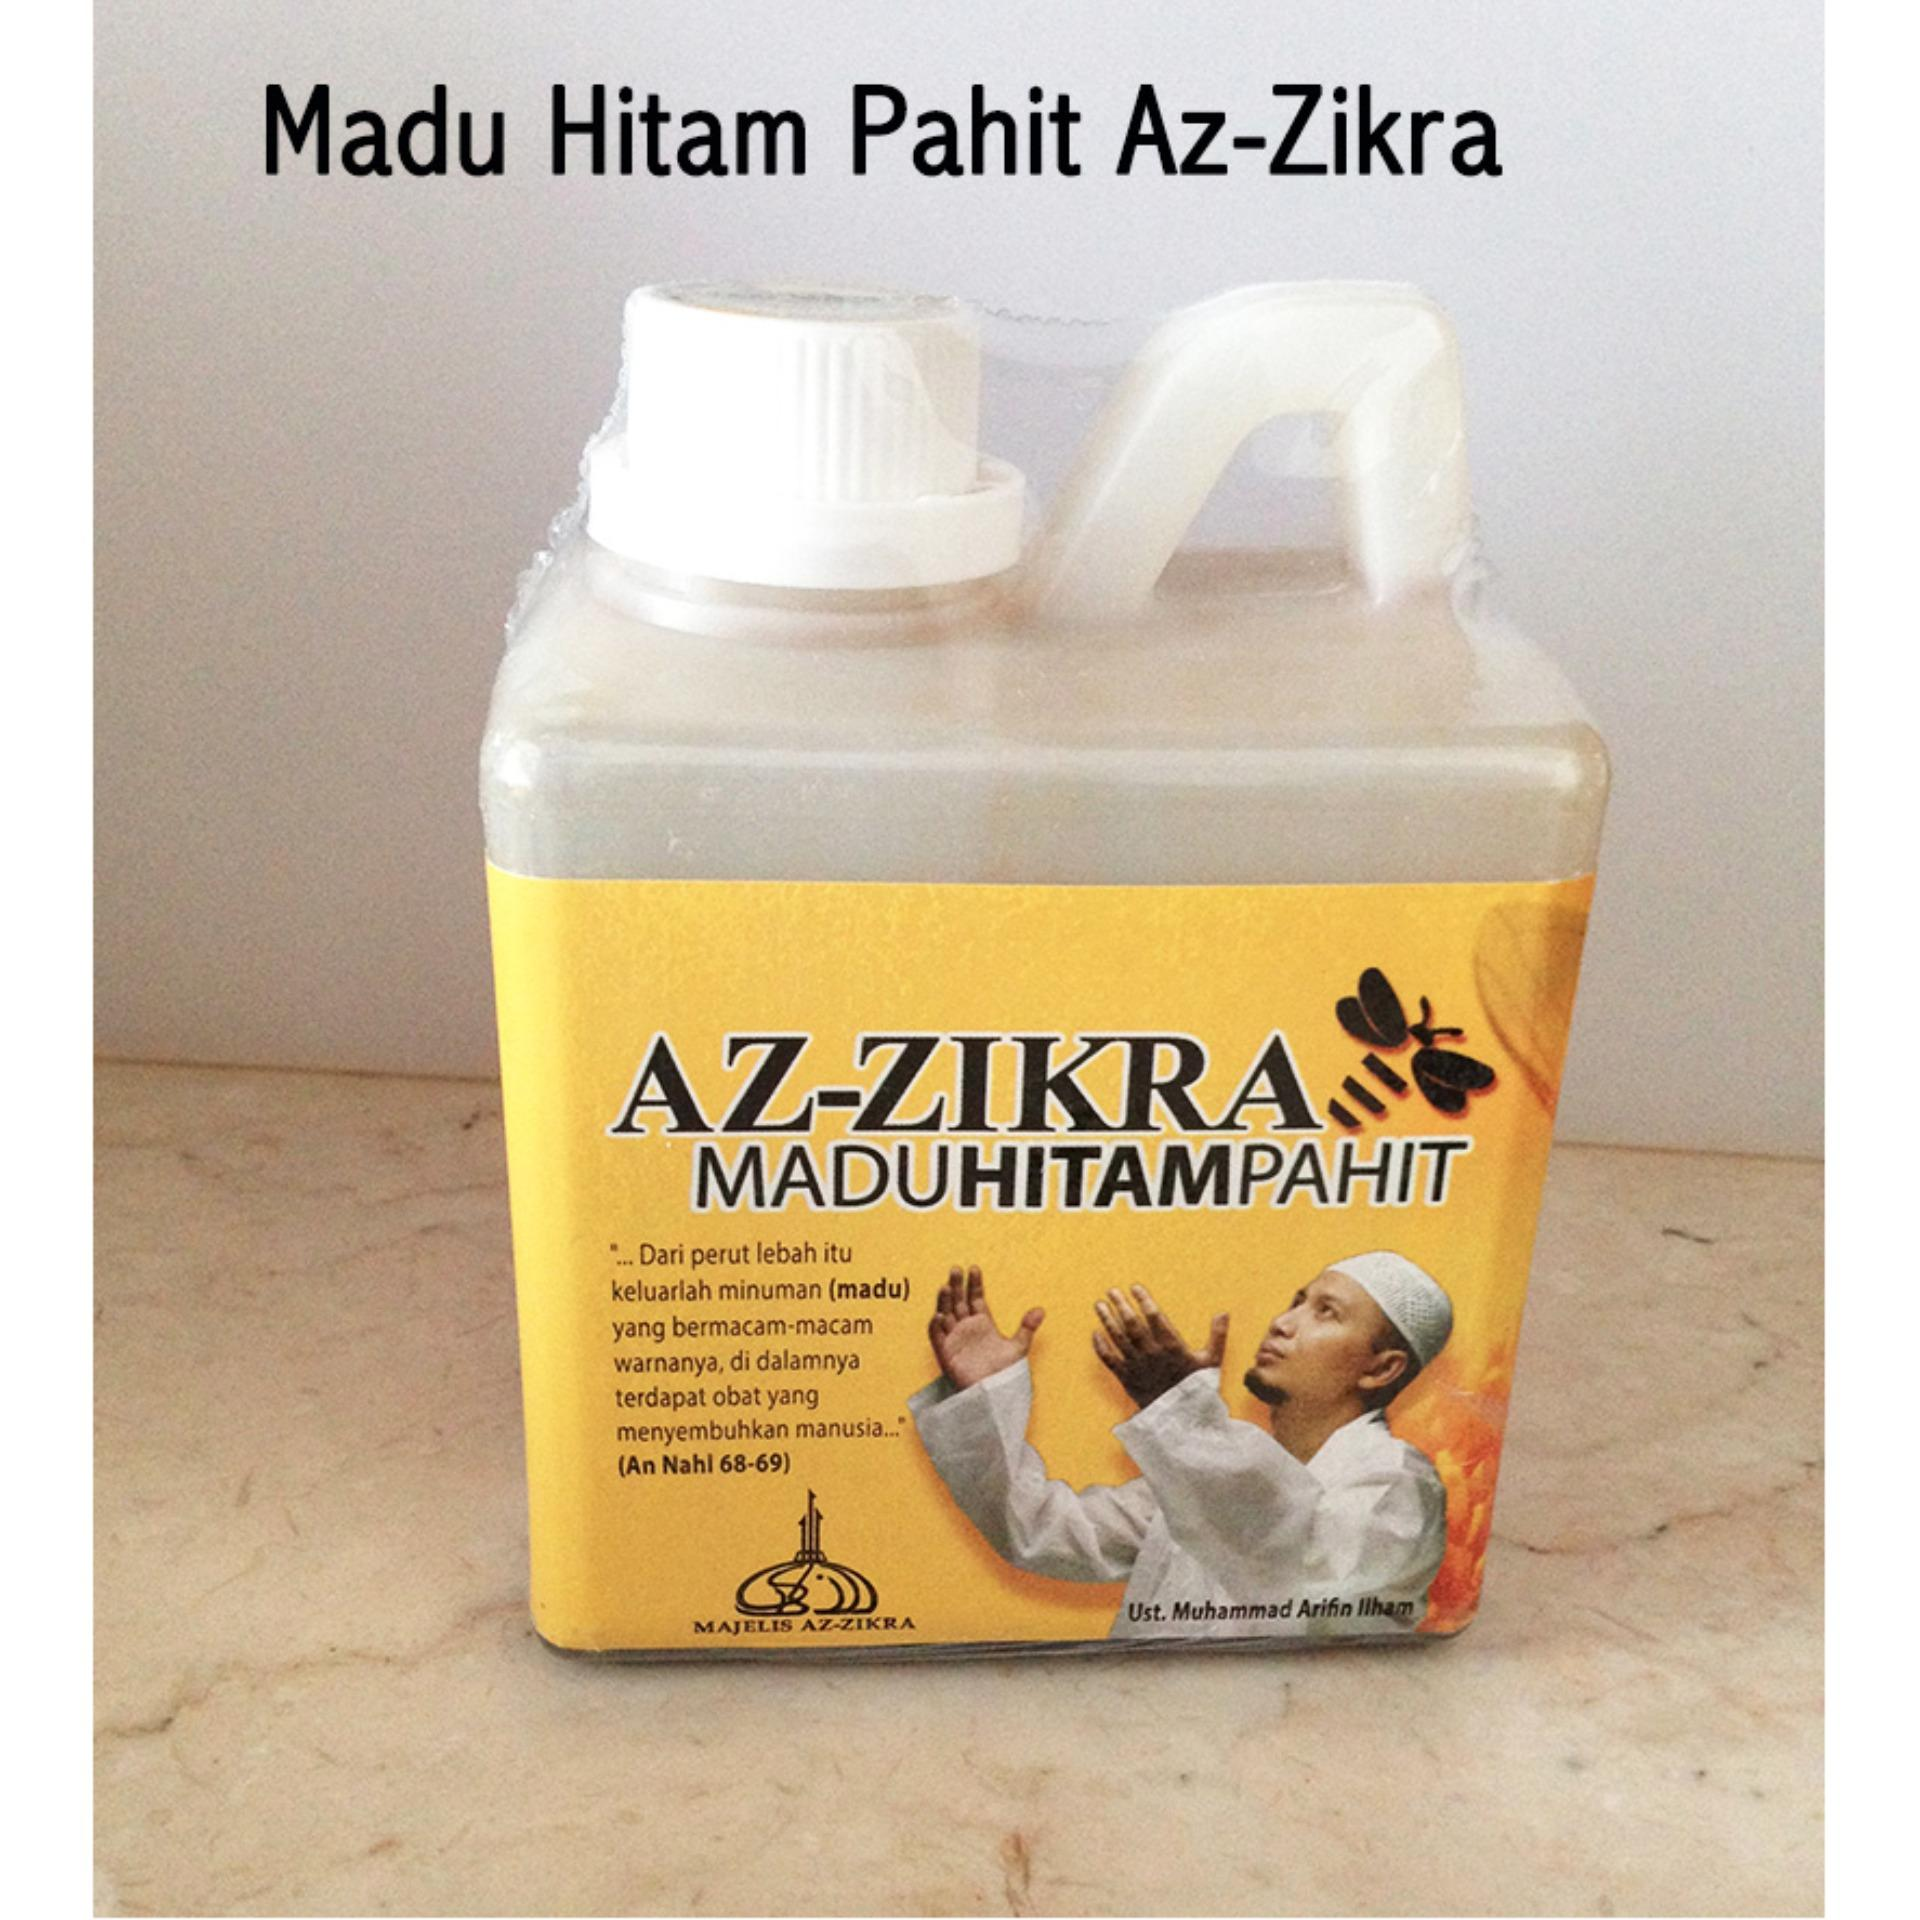 Pencari Harga Az Zikra Madu Hitam Pahit 500 Gr Propolis Ratu Lebah Asli Halal